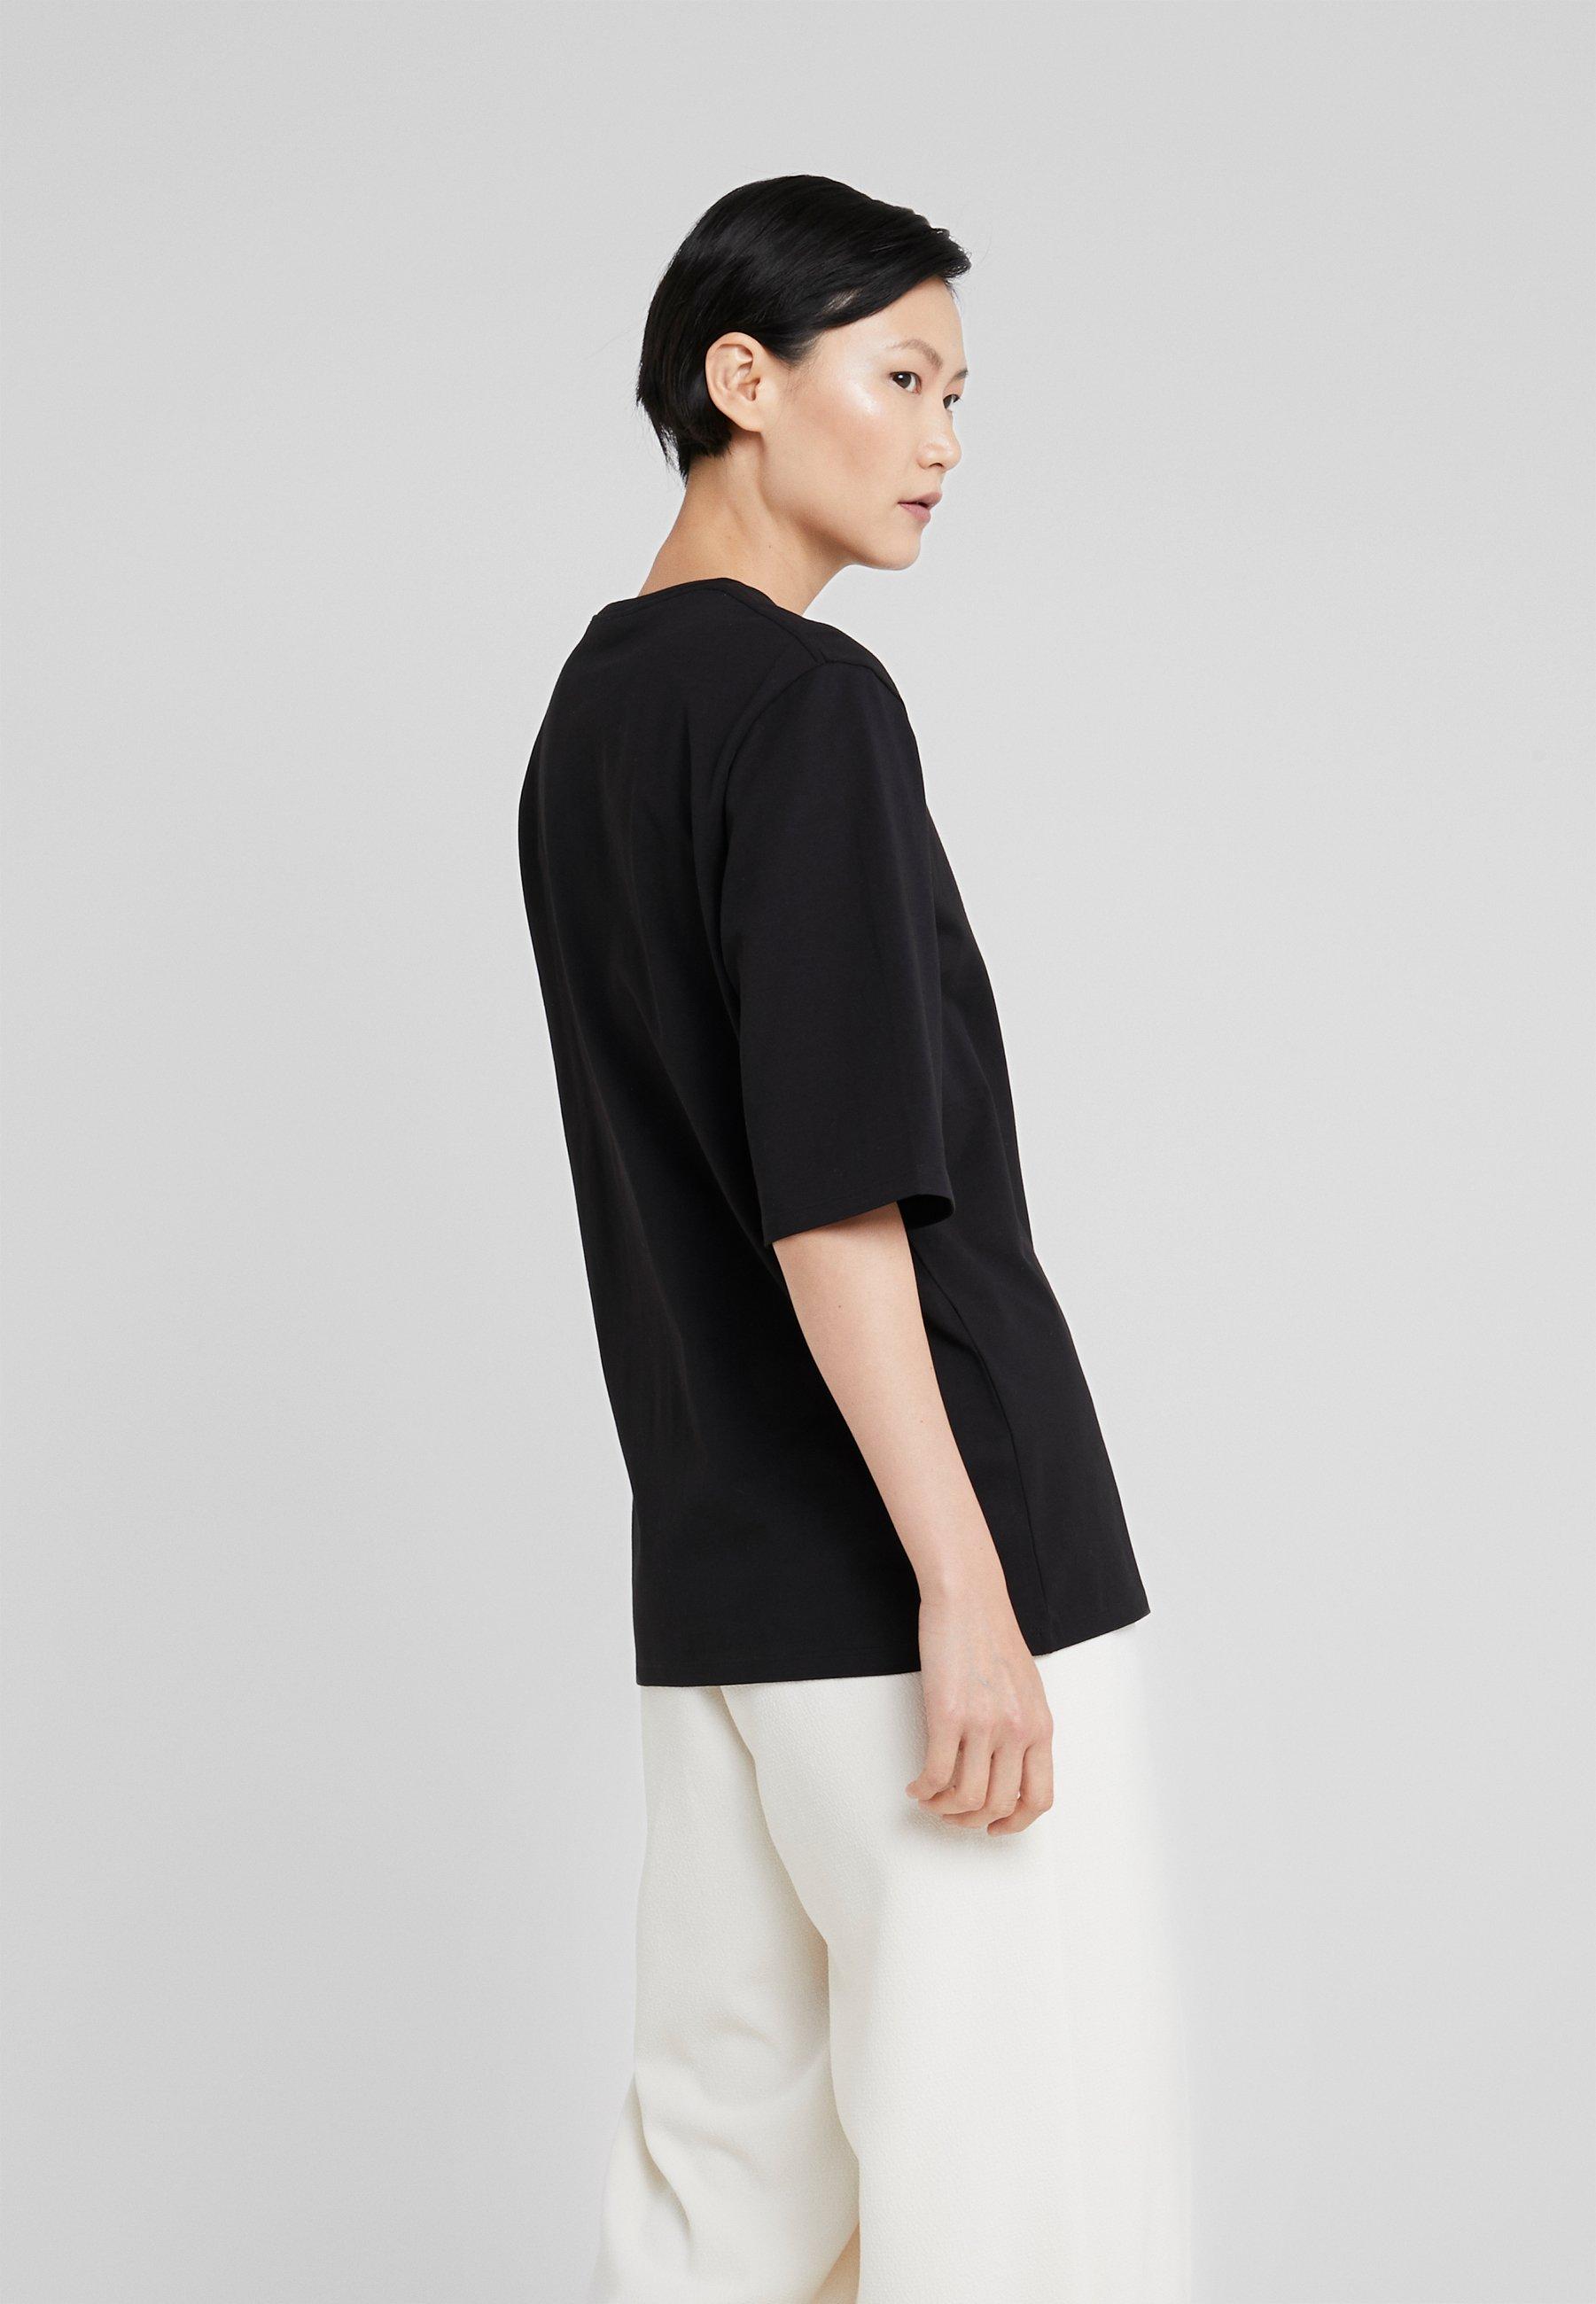 Basique Crew Long Filippa K shirt NeckT Black UzSqVMp